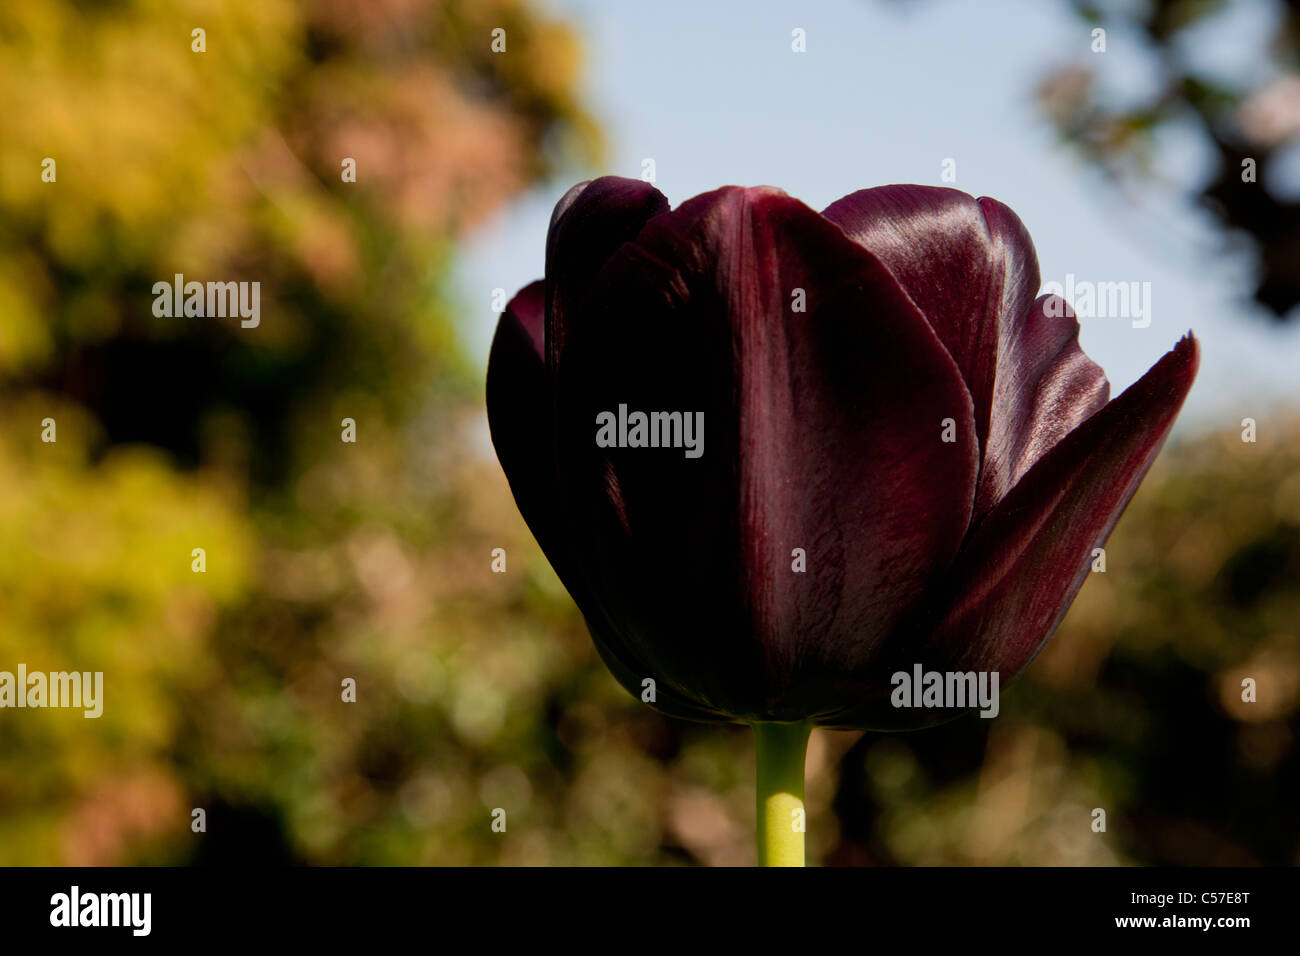 Close up of dark maroon tulip - Stock Image